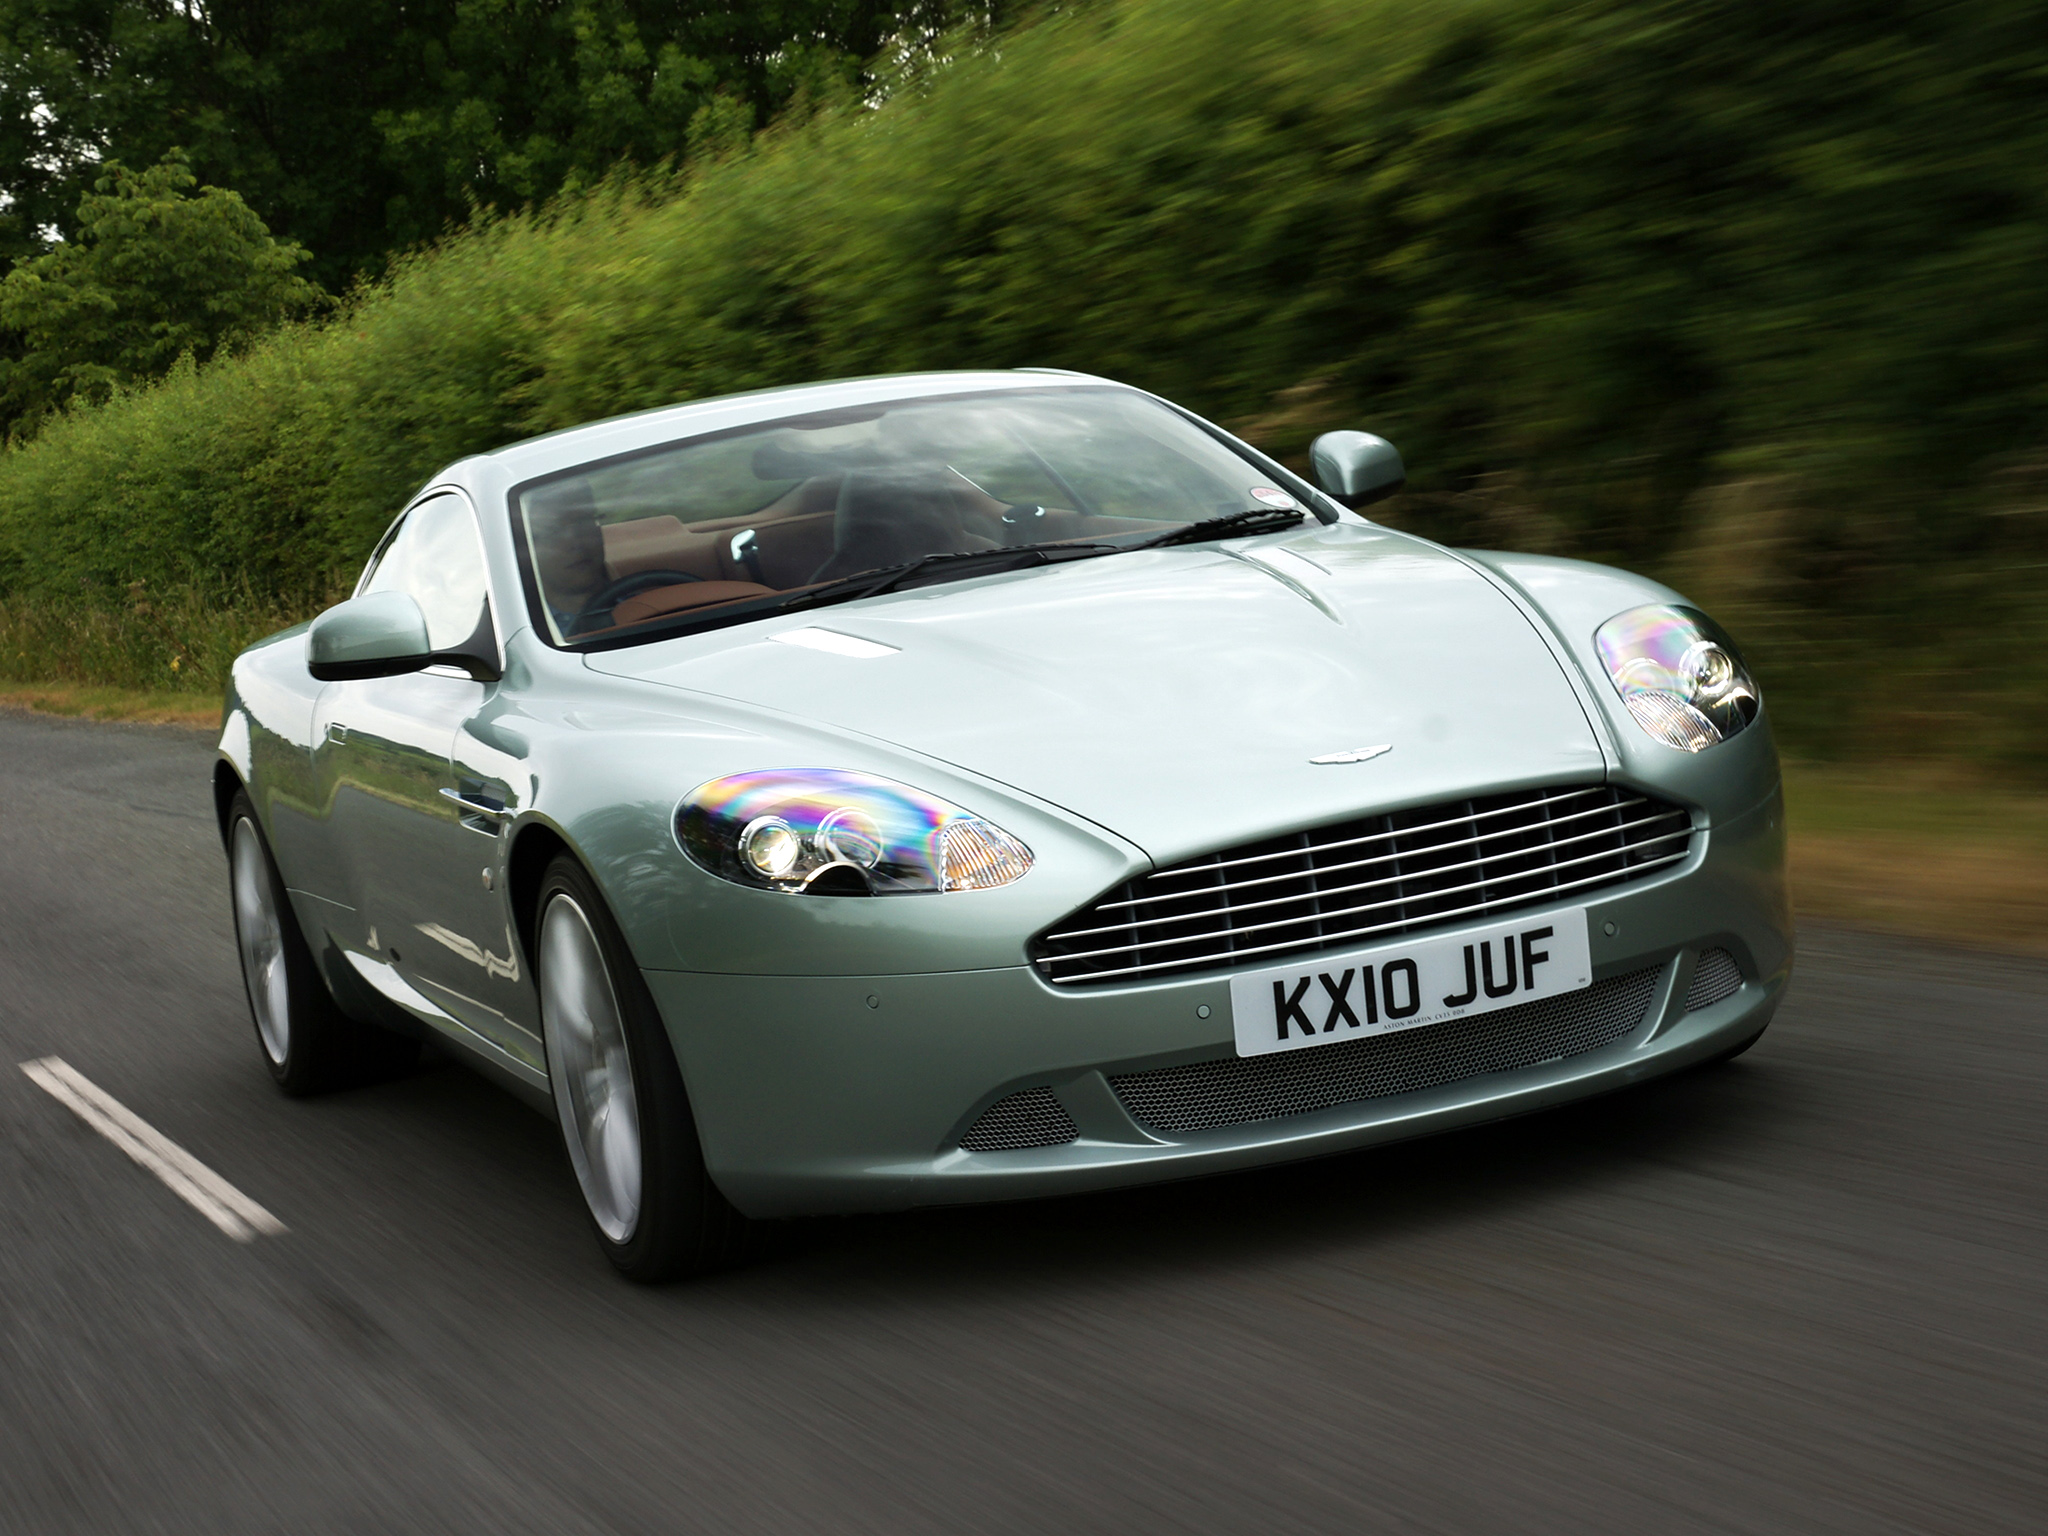 Aston Martin DB9 UK spec Wallpapers Car wallpapers HD 2048x1536